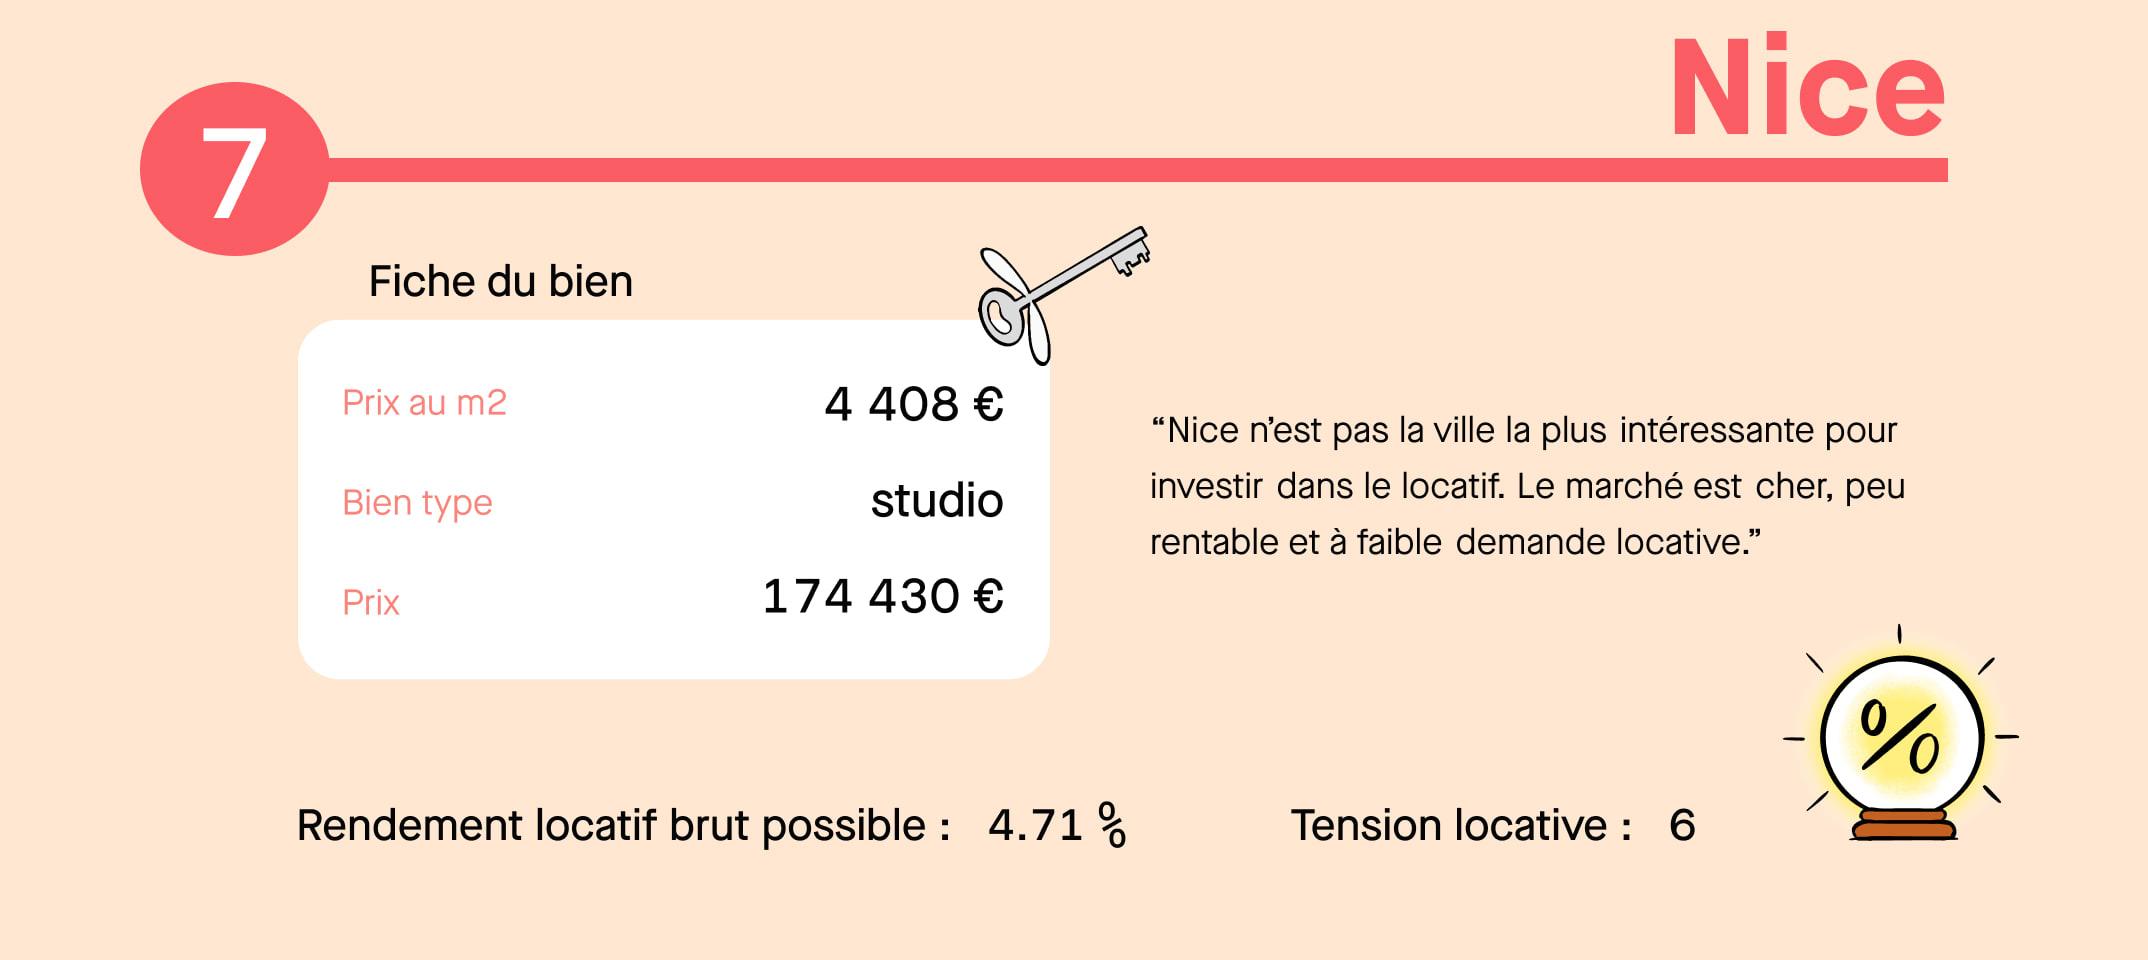 Infographie investissement locatif Nice